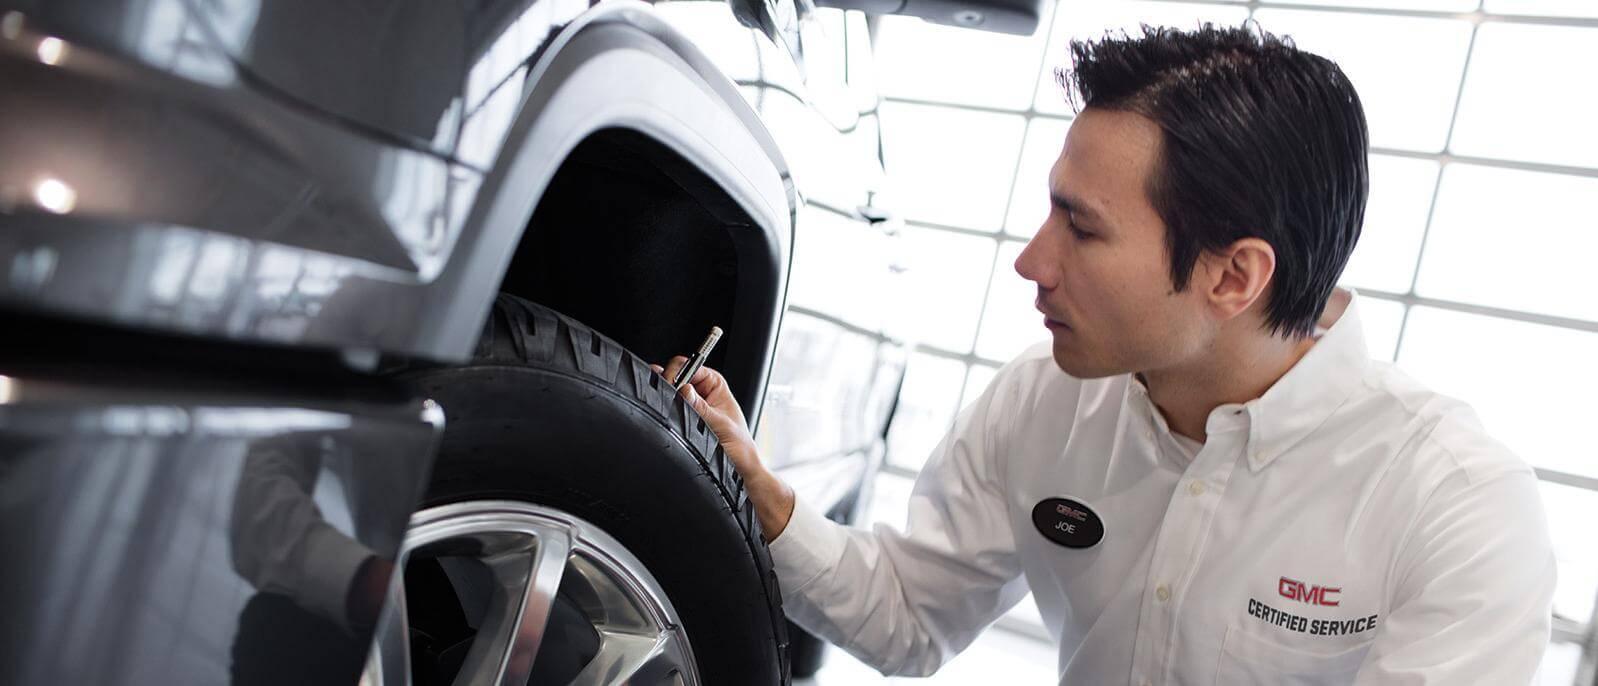 Checking tire tread depth